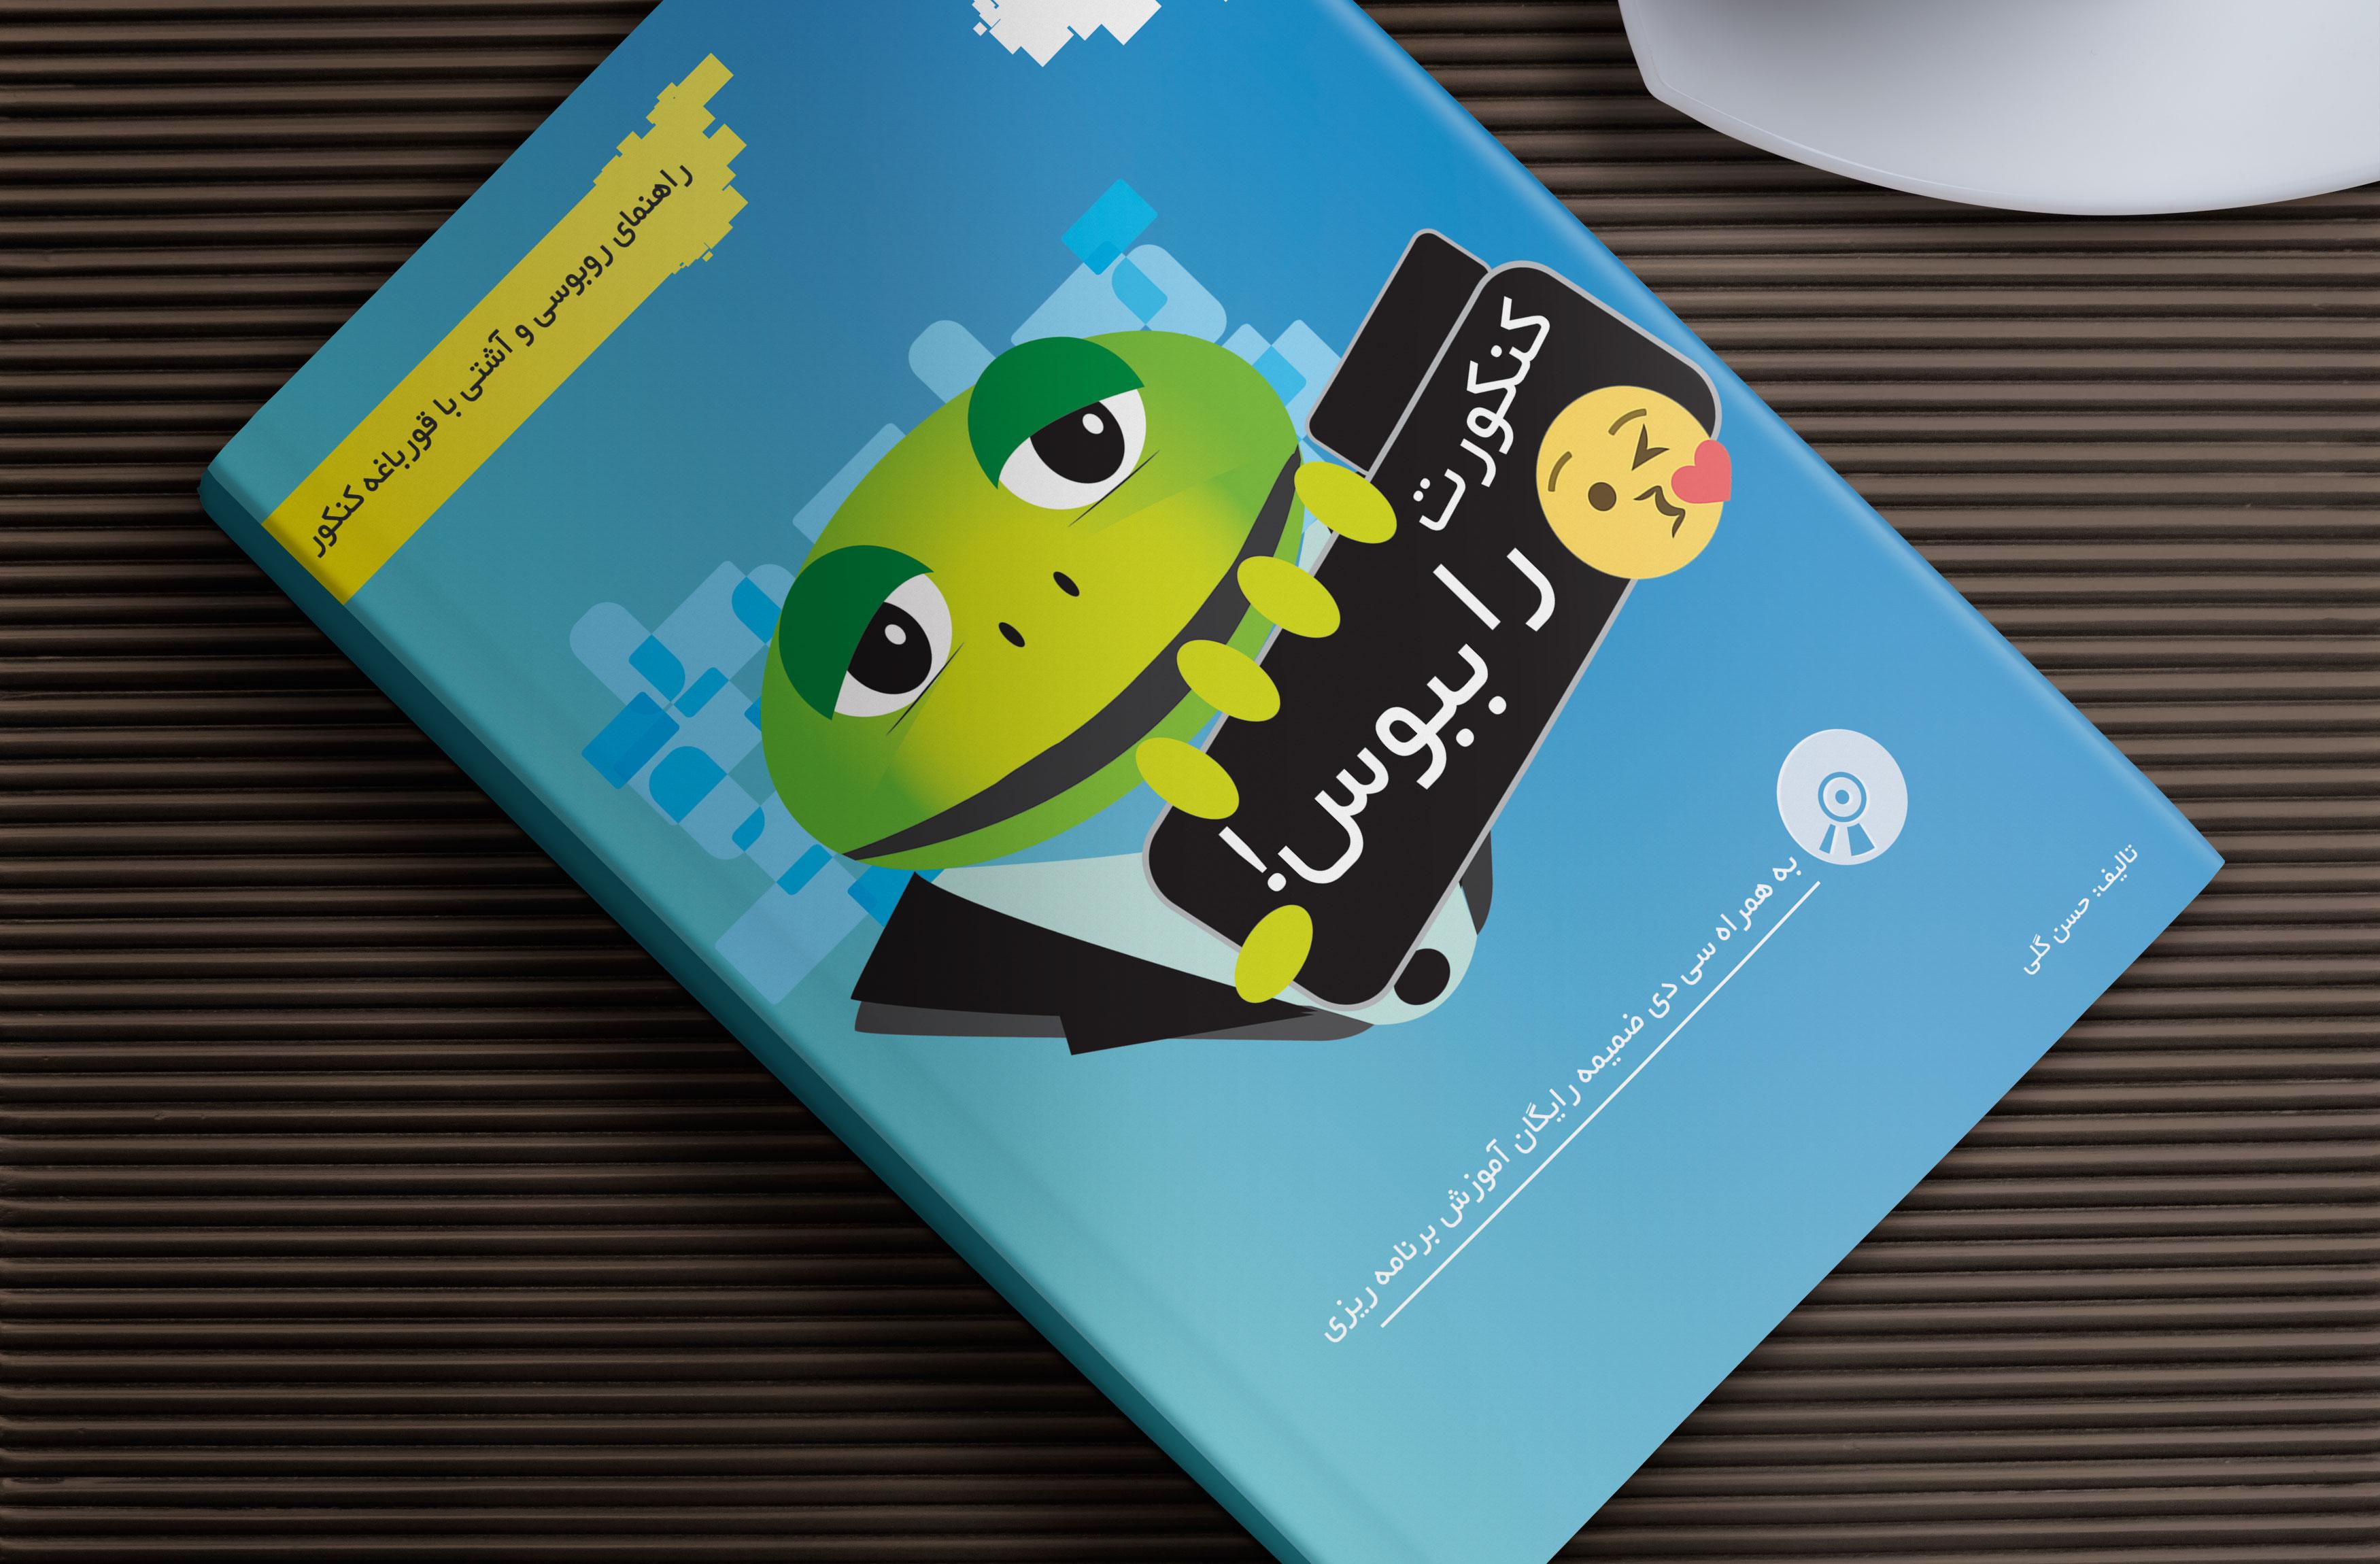 book mockup free معرفی منابع عمومی برای کنکور